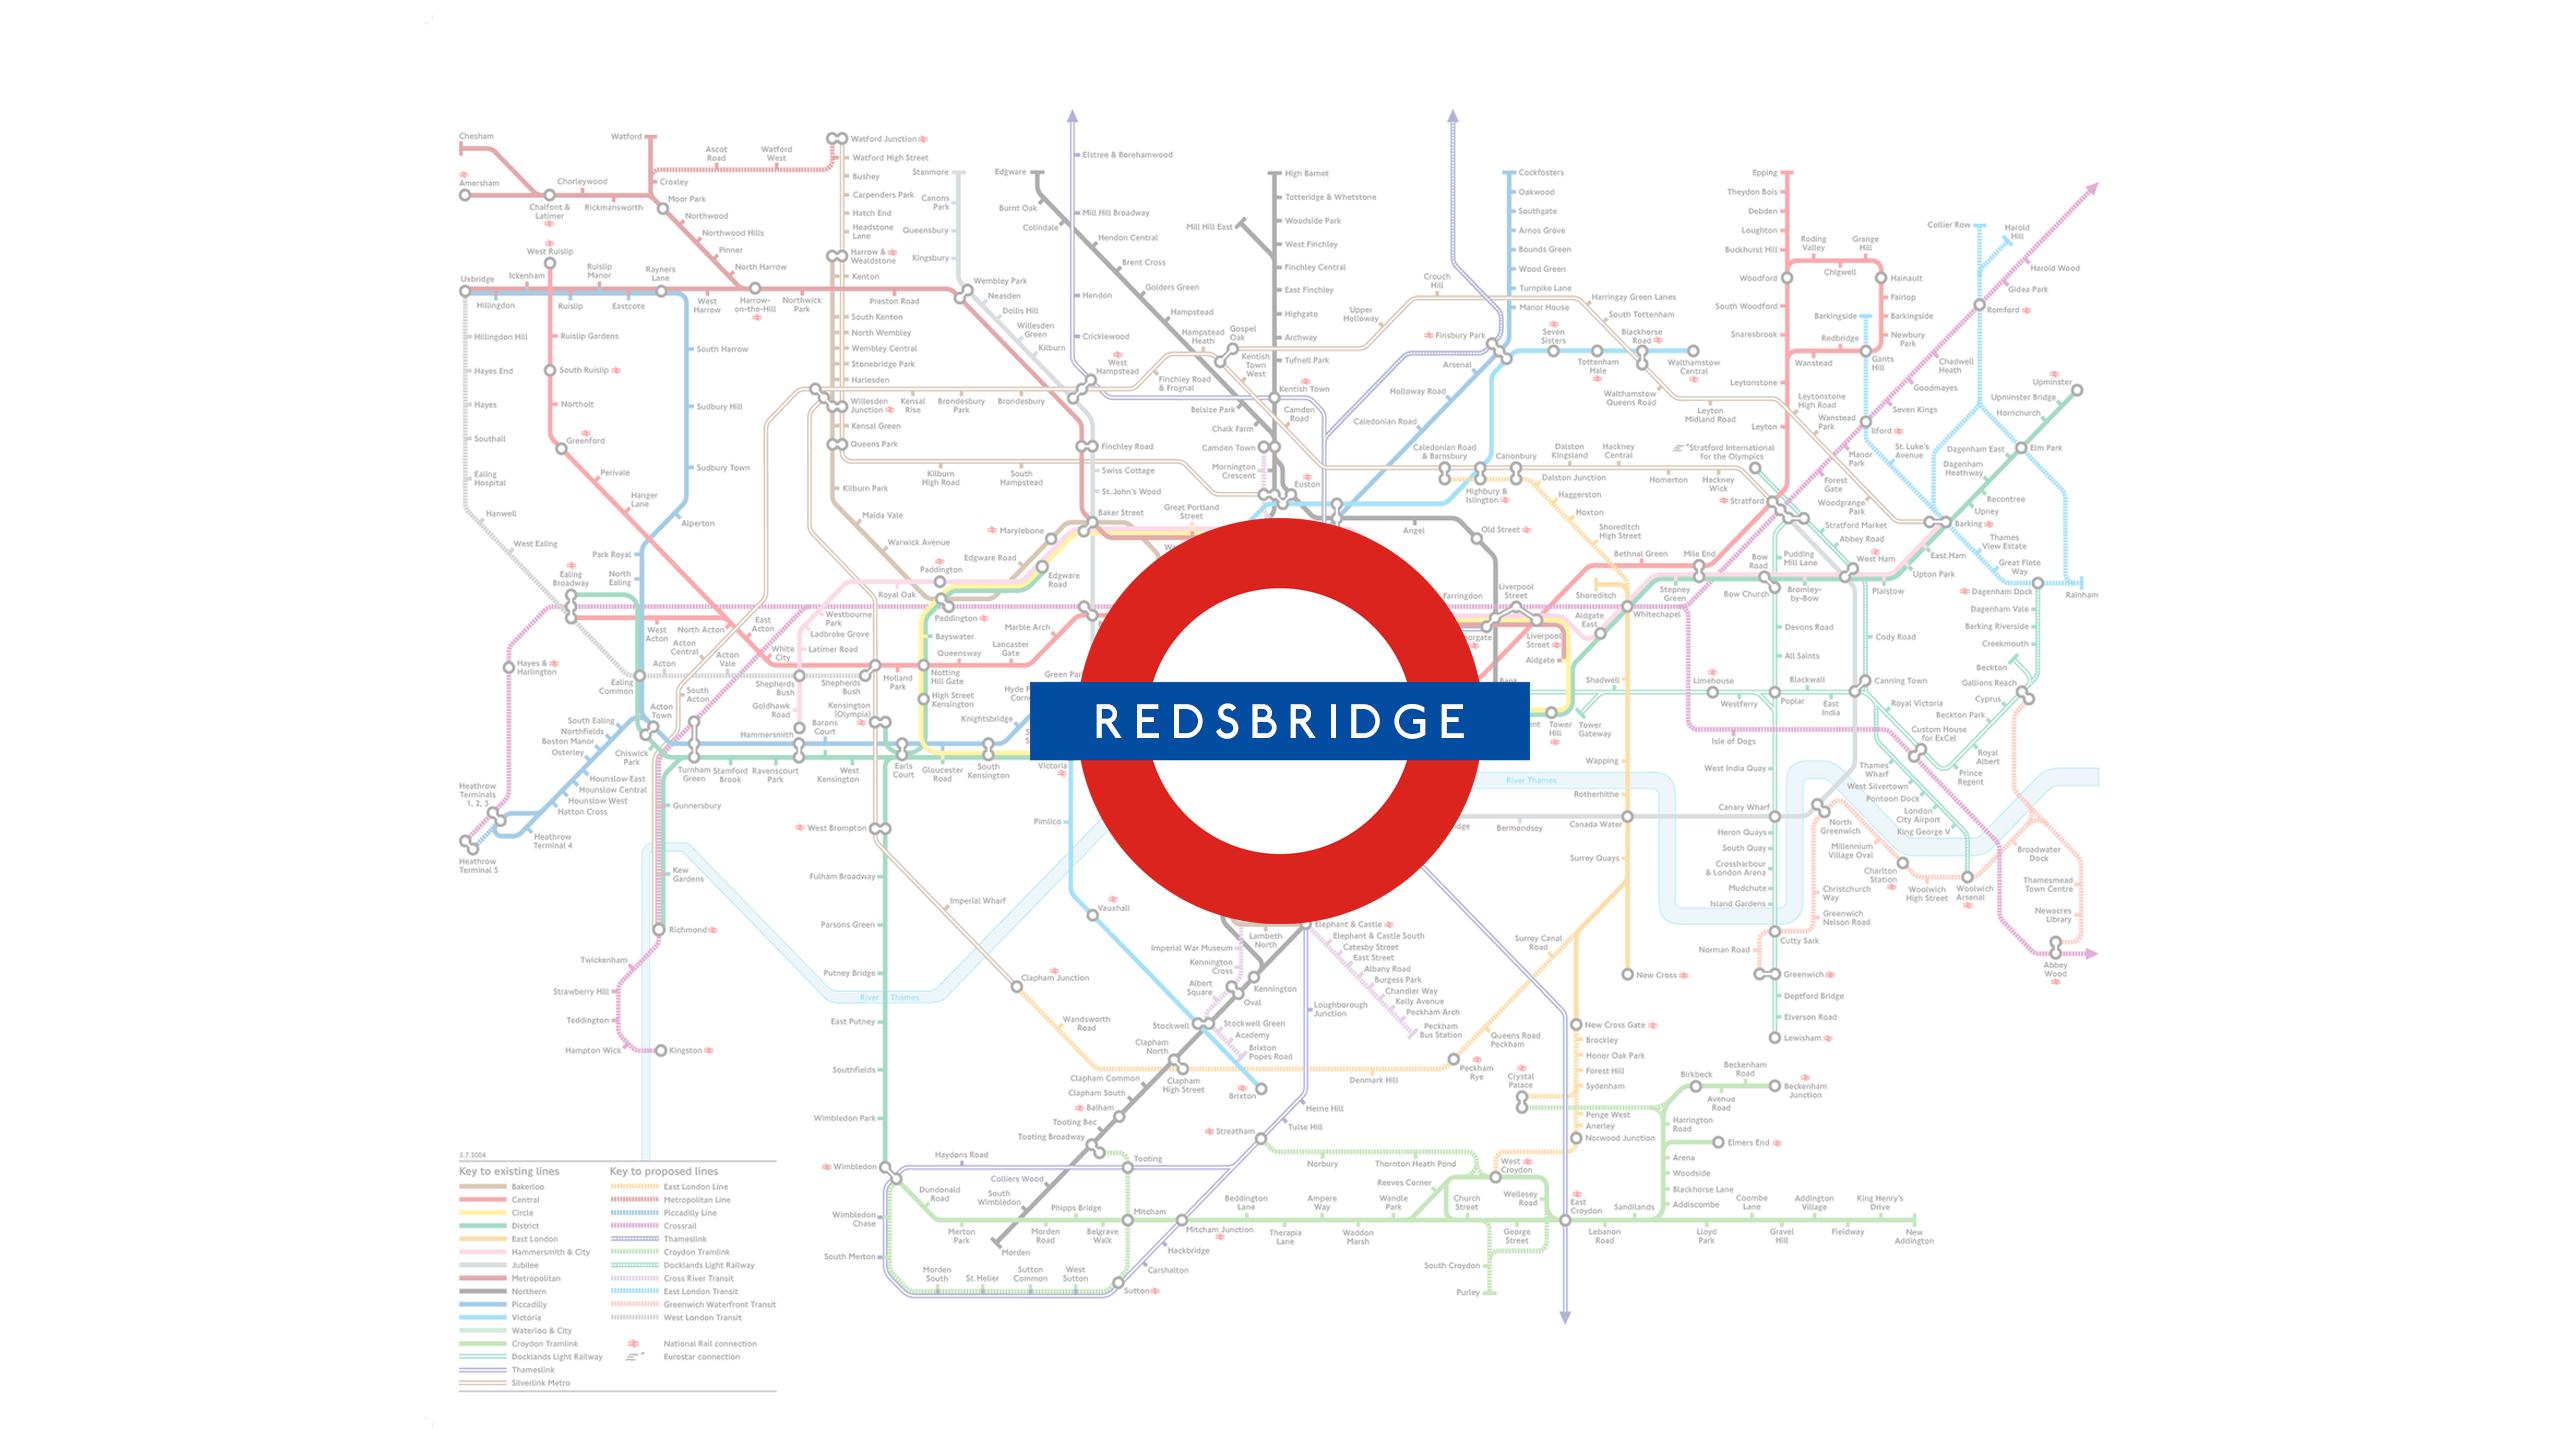 Redsbridge (Map)